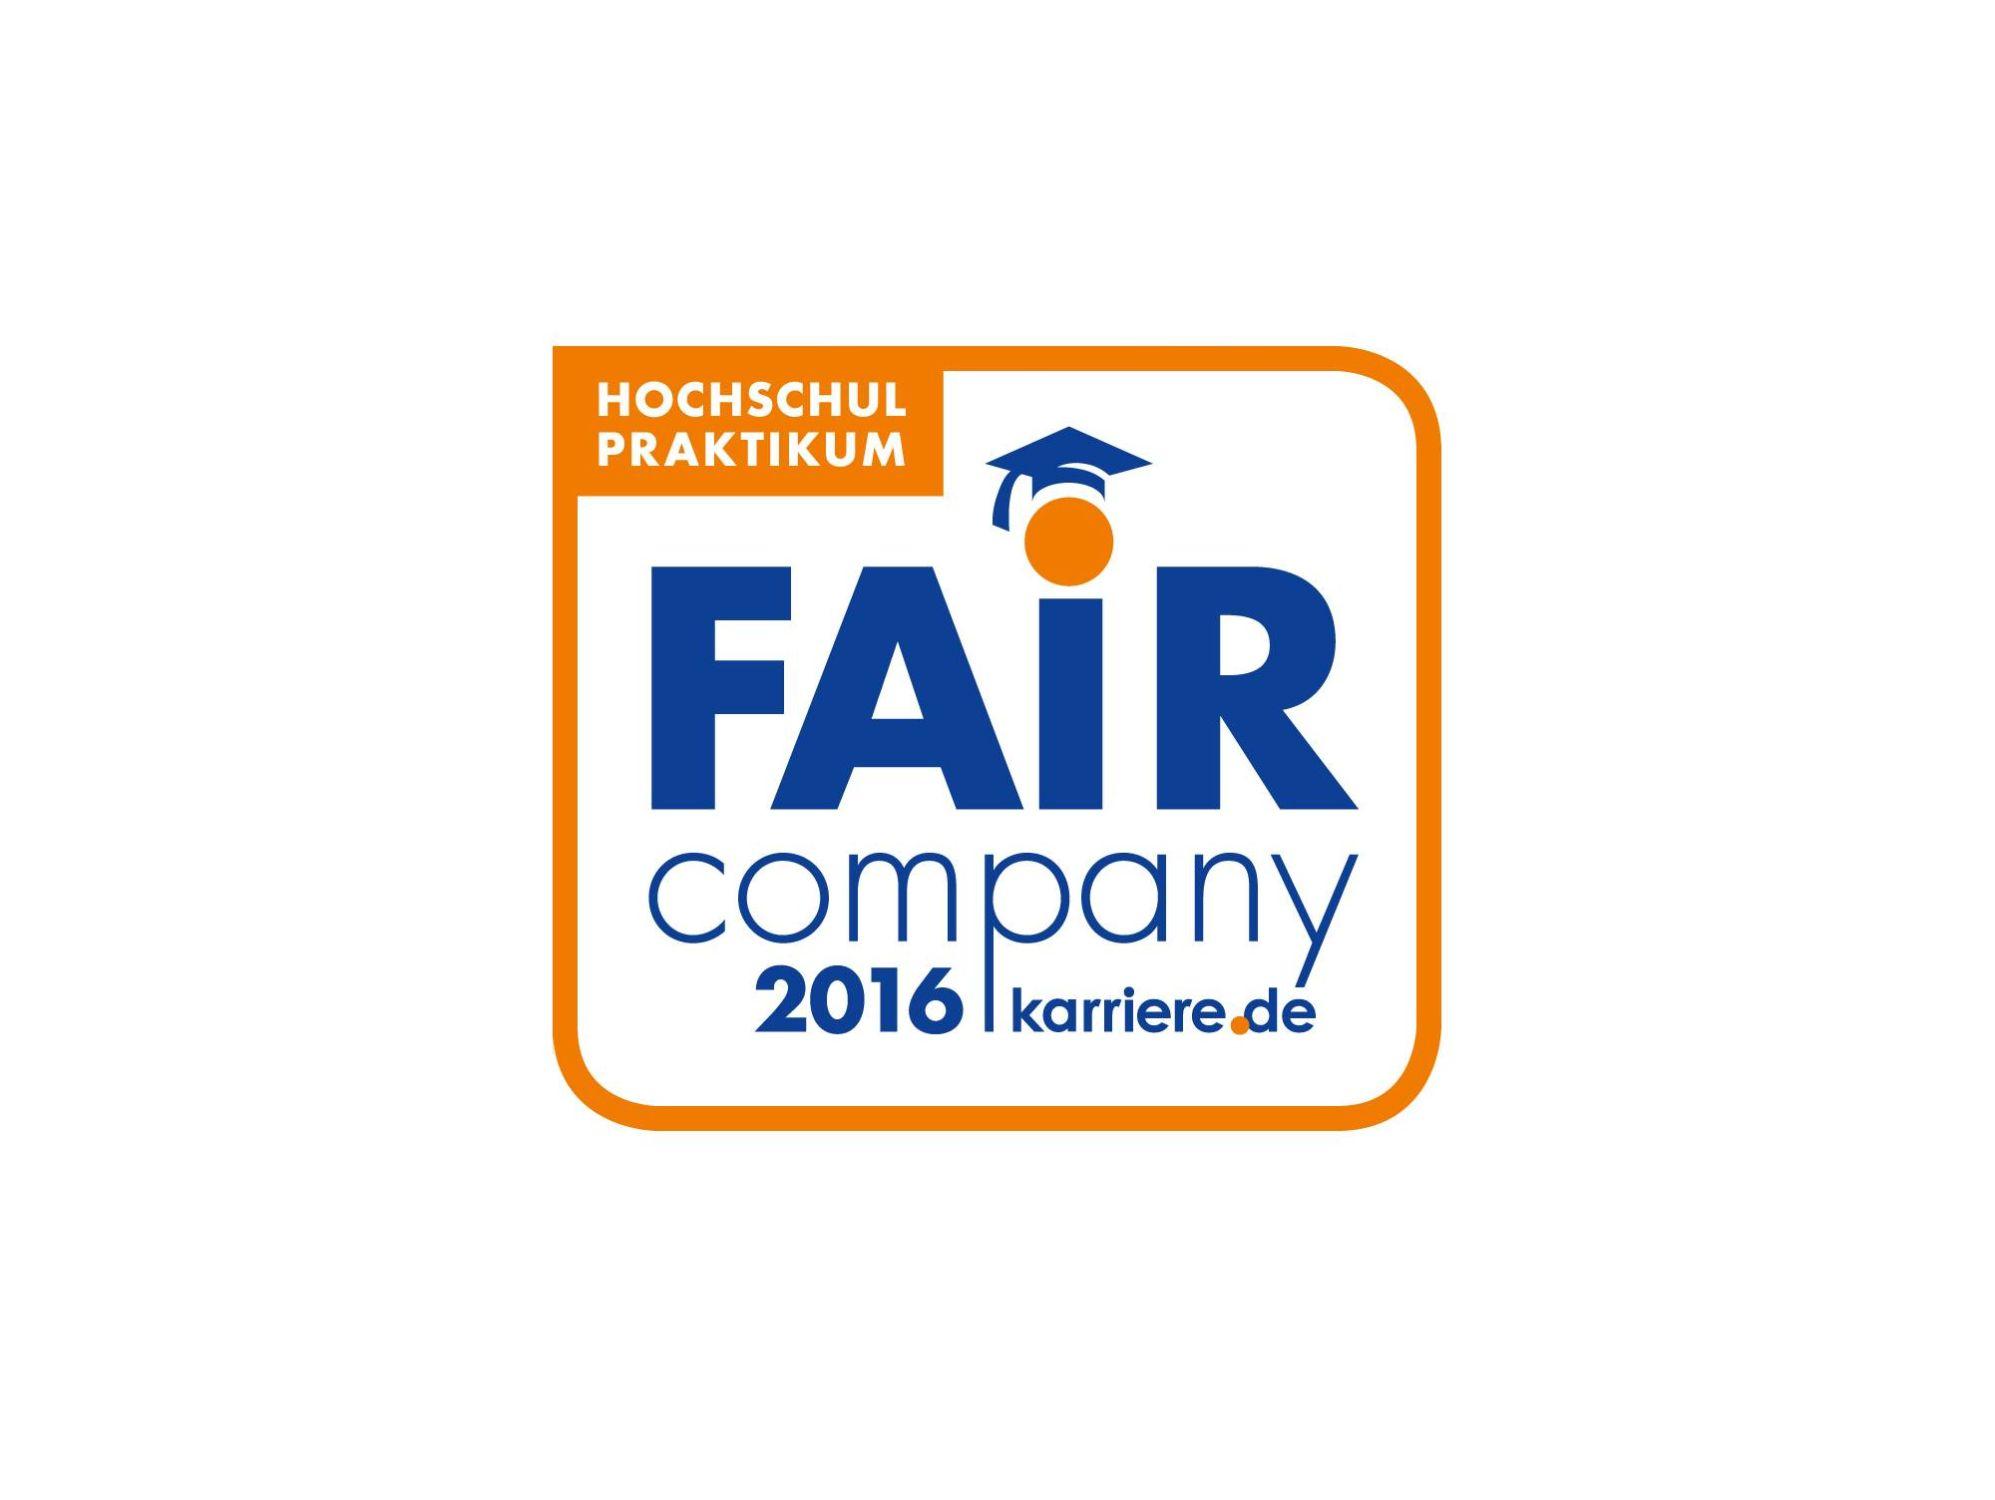 fair-company-logo.jpg